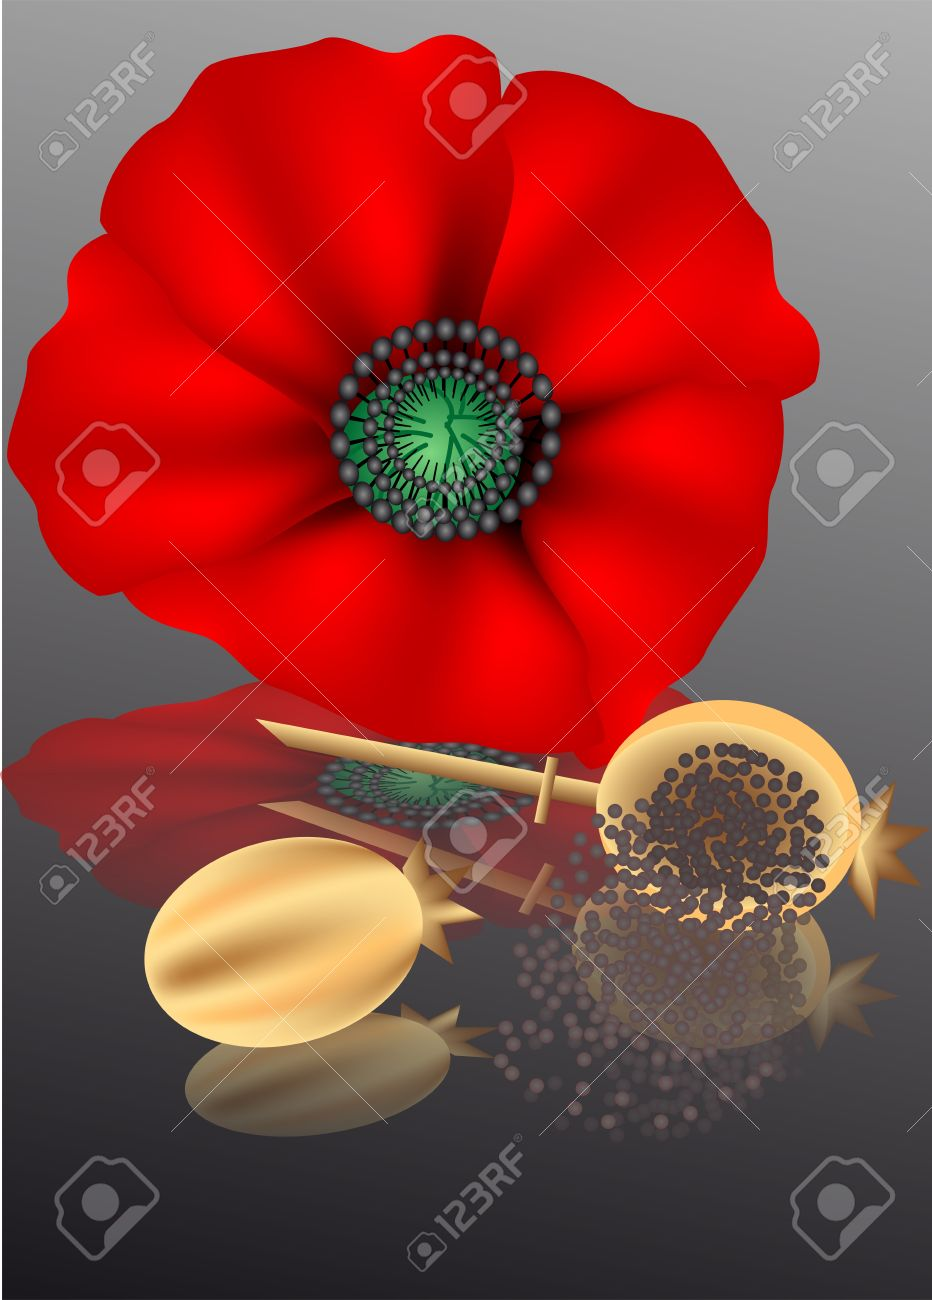 Poppy Seeds With Poppy Flower On A Dark Background Royalty Free